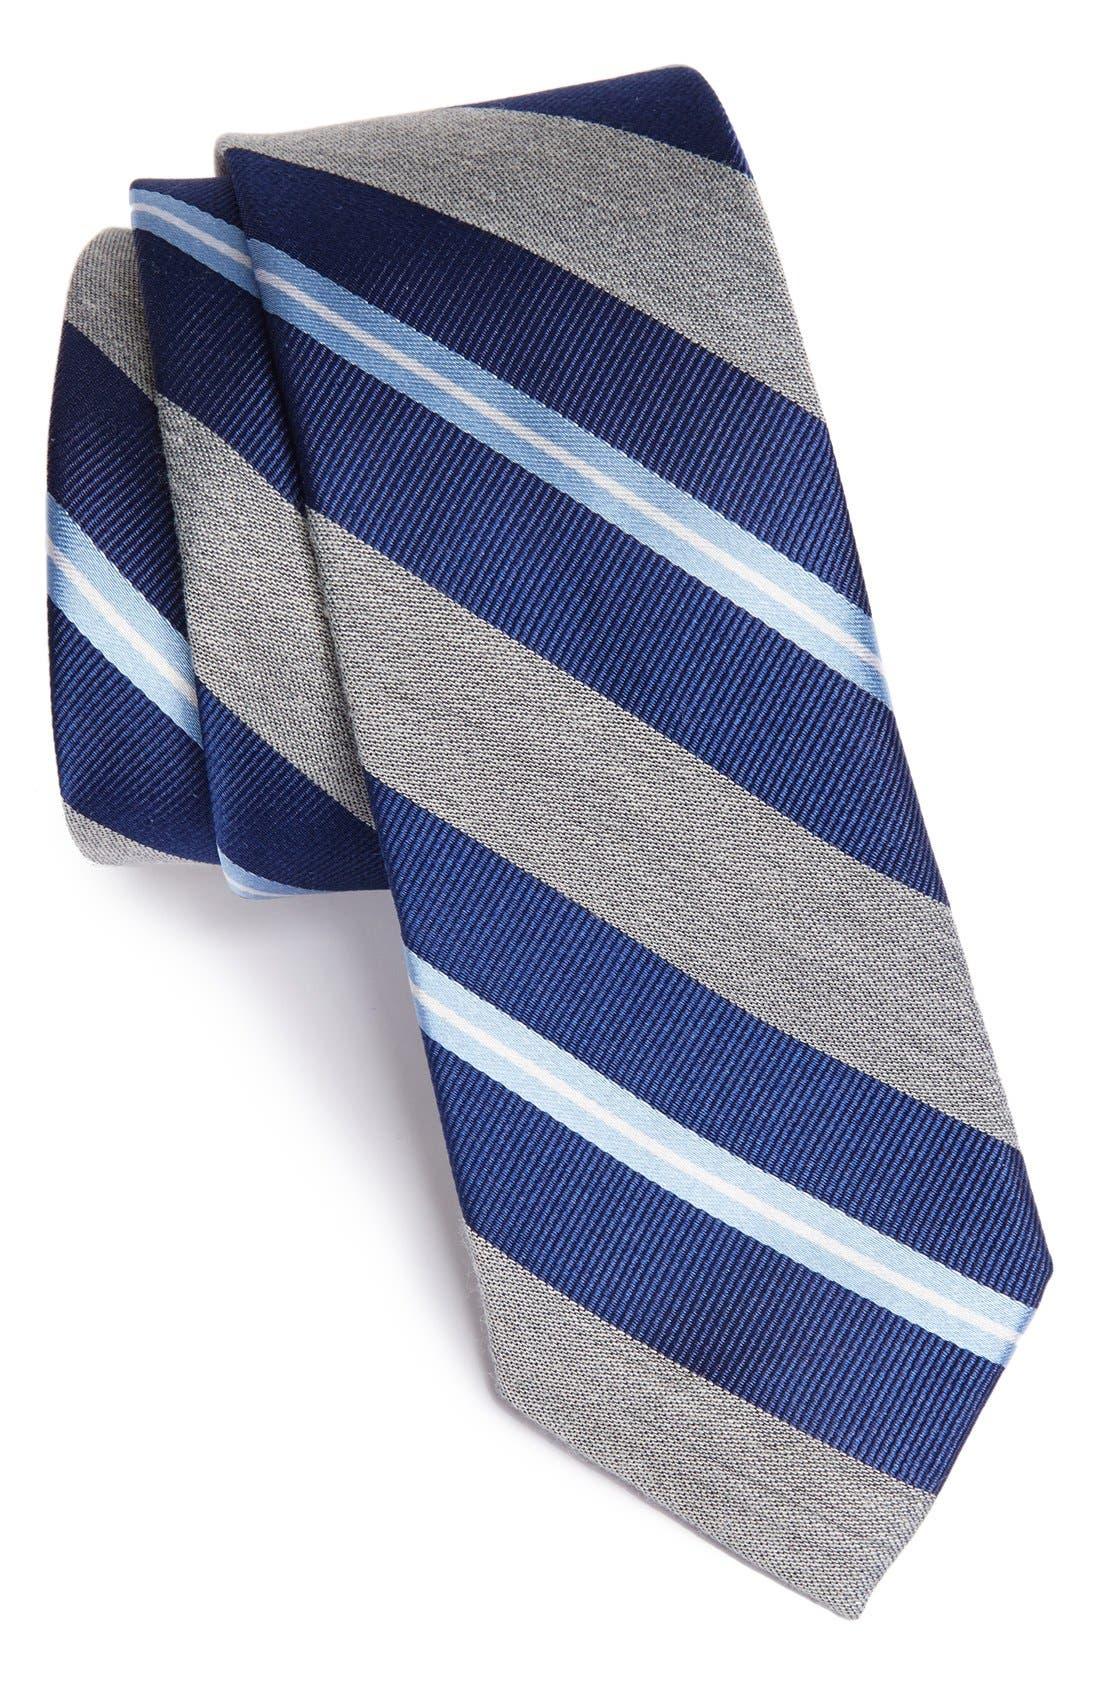 'Brady' Woven Silk Blend Tie,                             Main thumbnail 1, color,                             Navy